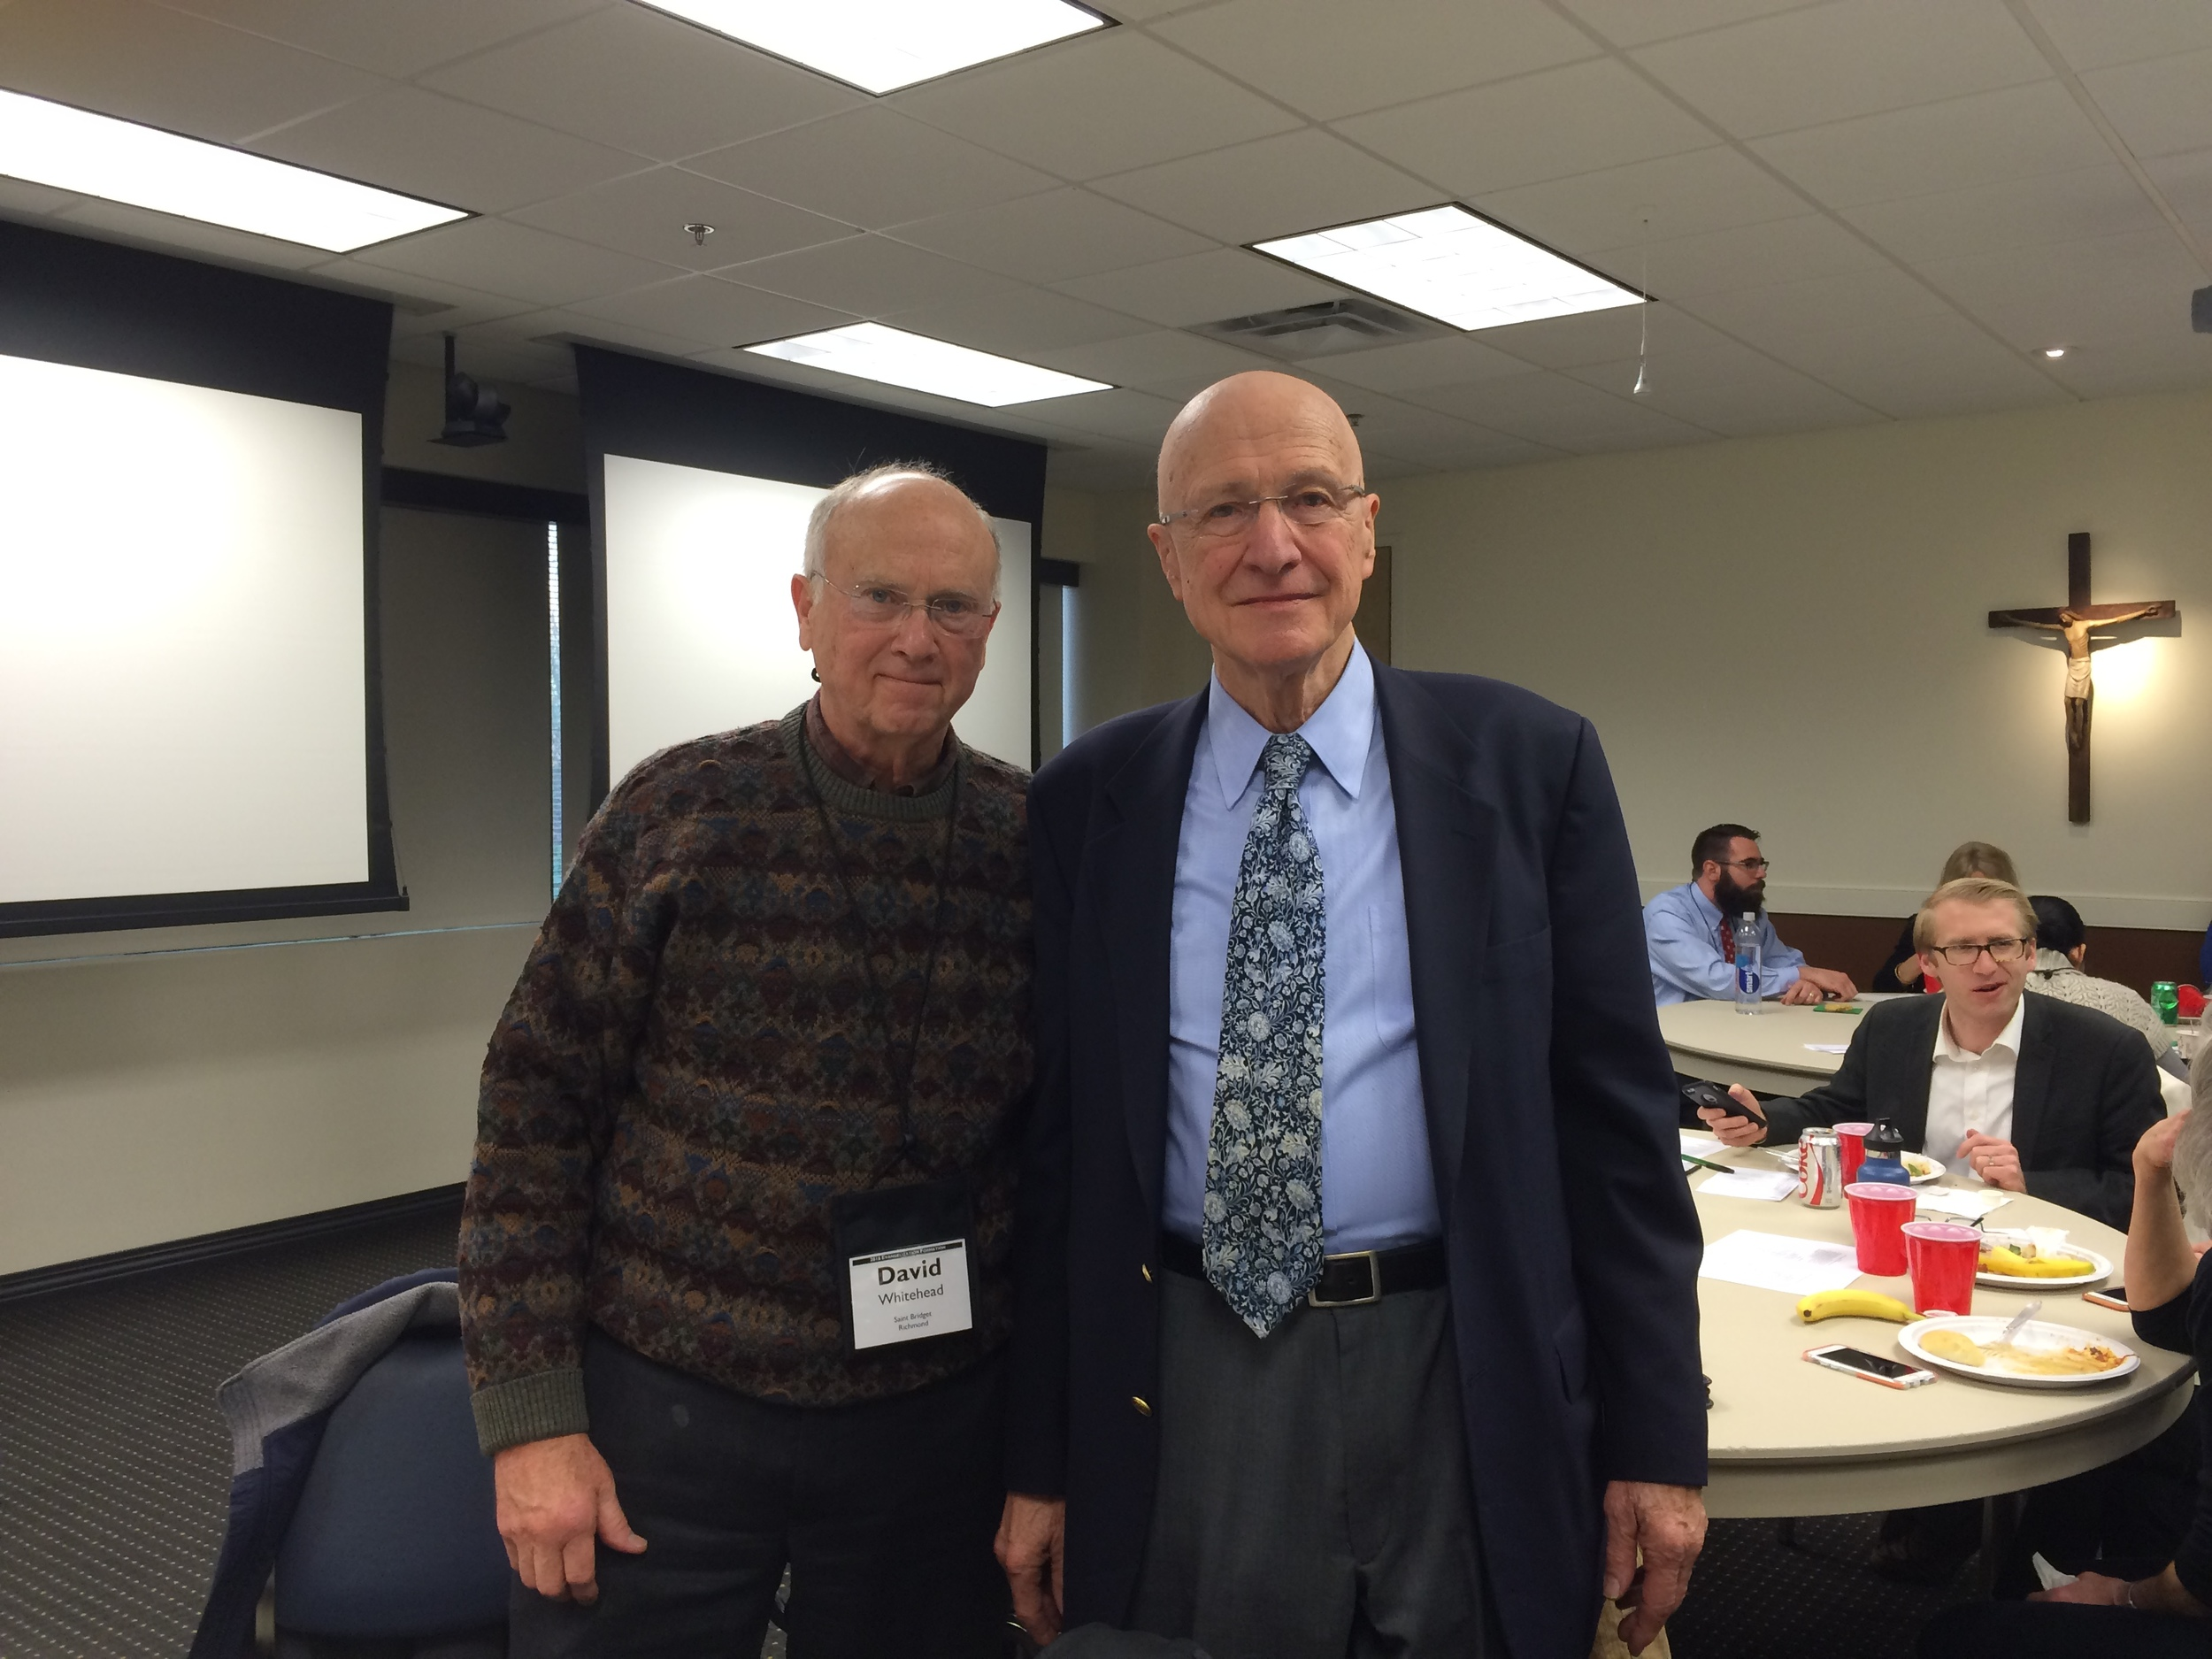 David W. with Peter Kreeft (Thanks to John M.)